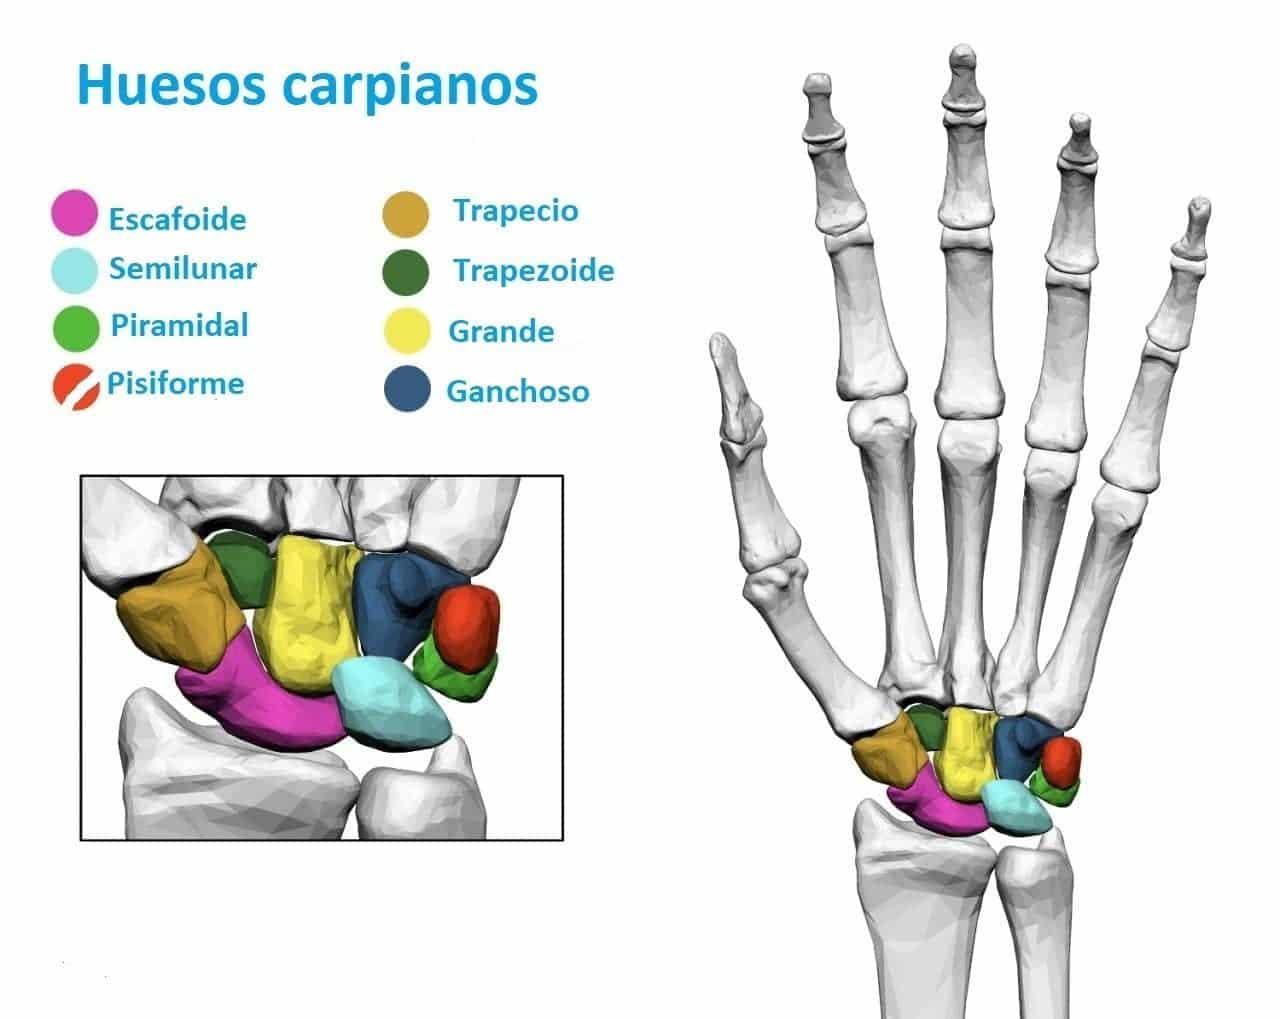 Huesos Carpianos O Huesos Del Carpo